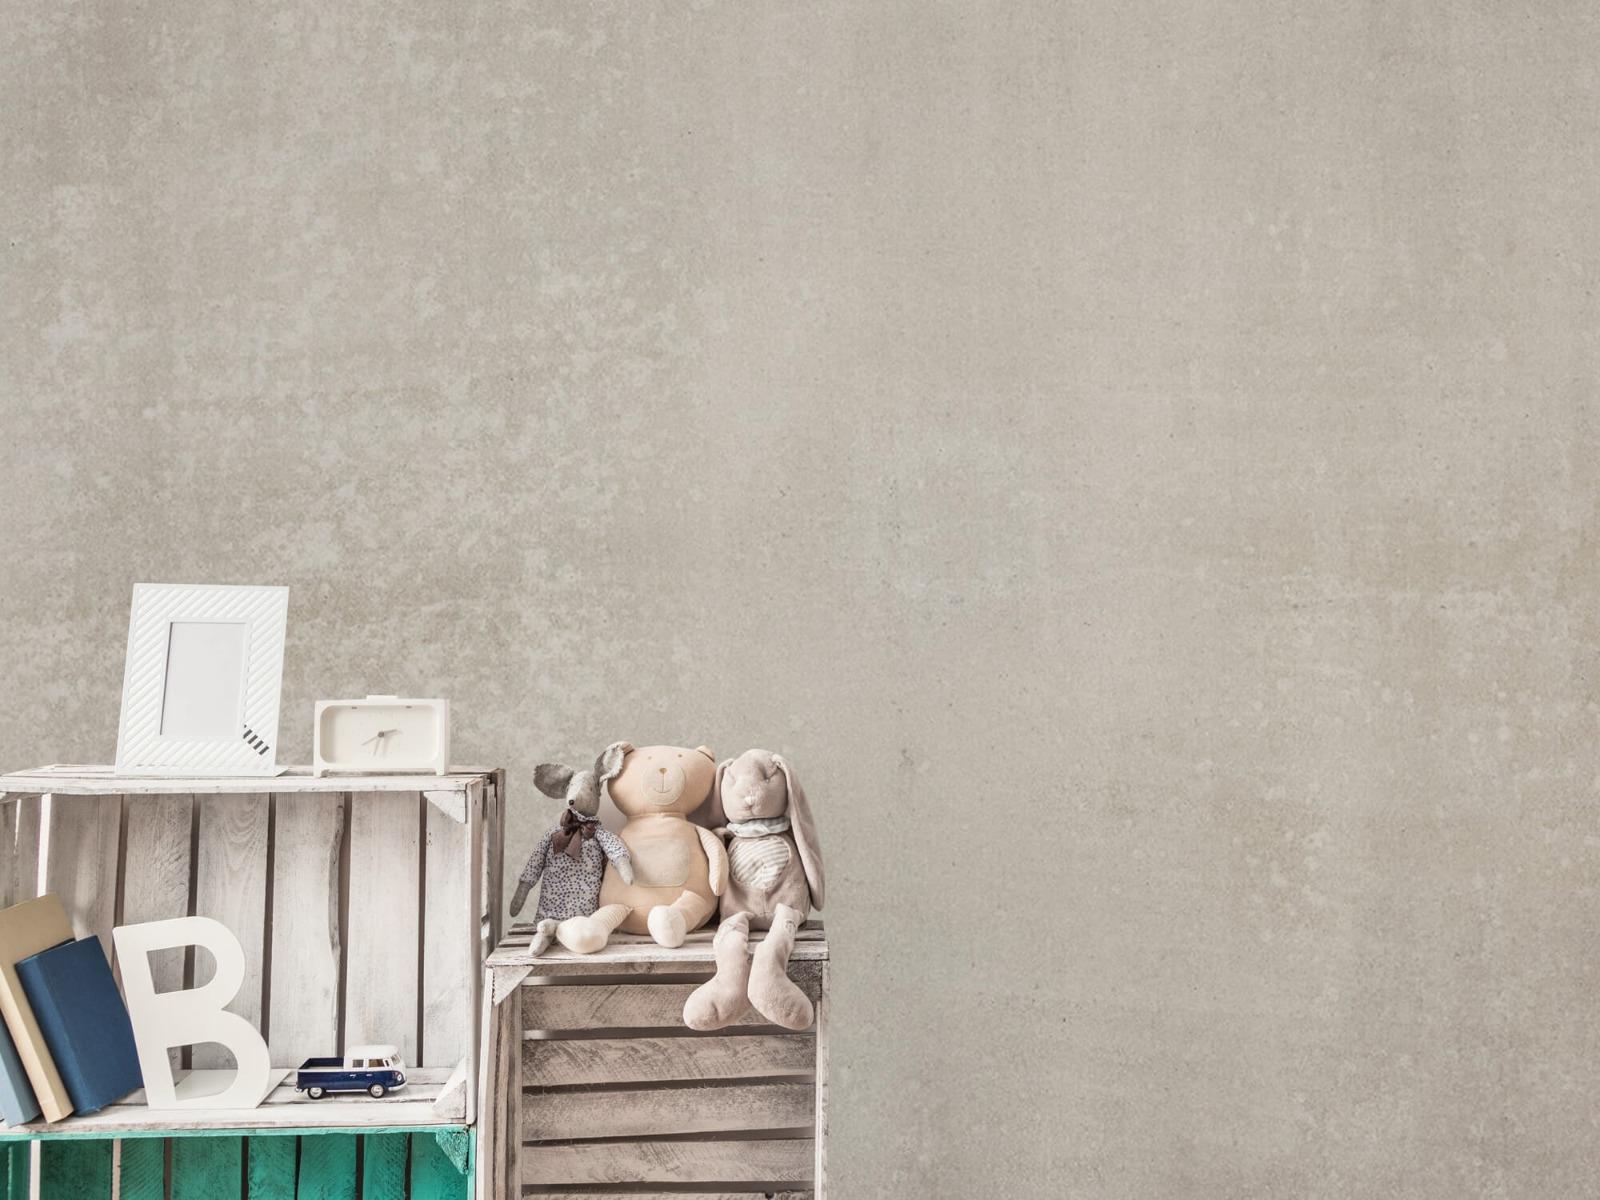 Betonlook behang - Taupe beton - Wallexclusive - Woonkamer 19